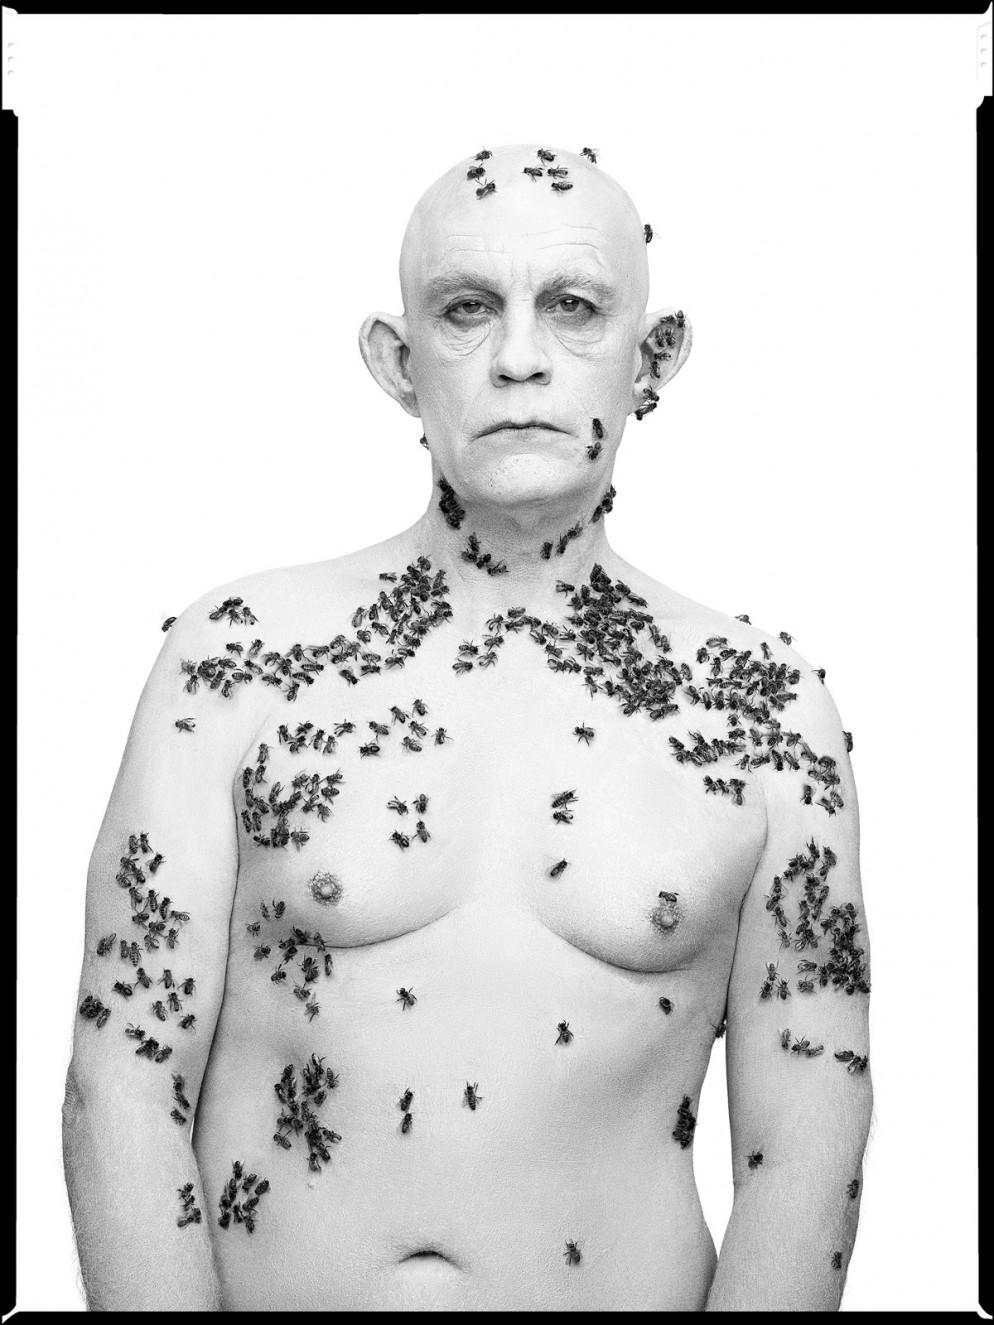 john-malkovich-mostra-fotografia-trieste-07